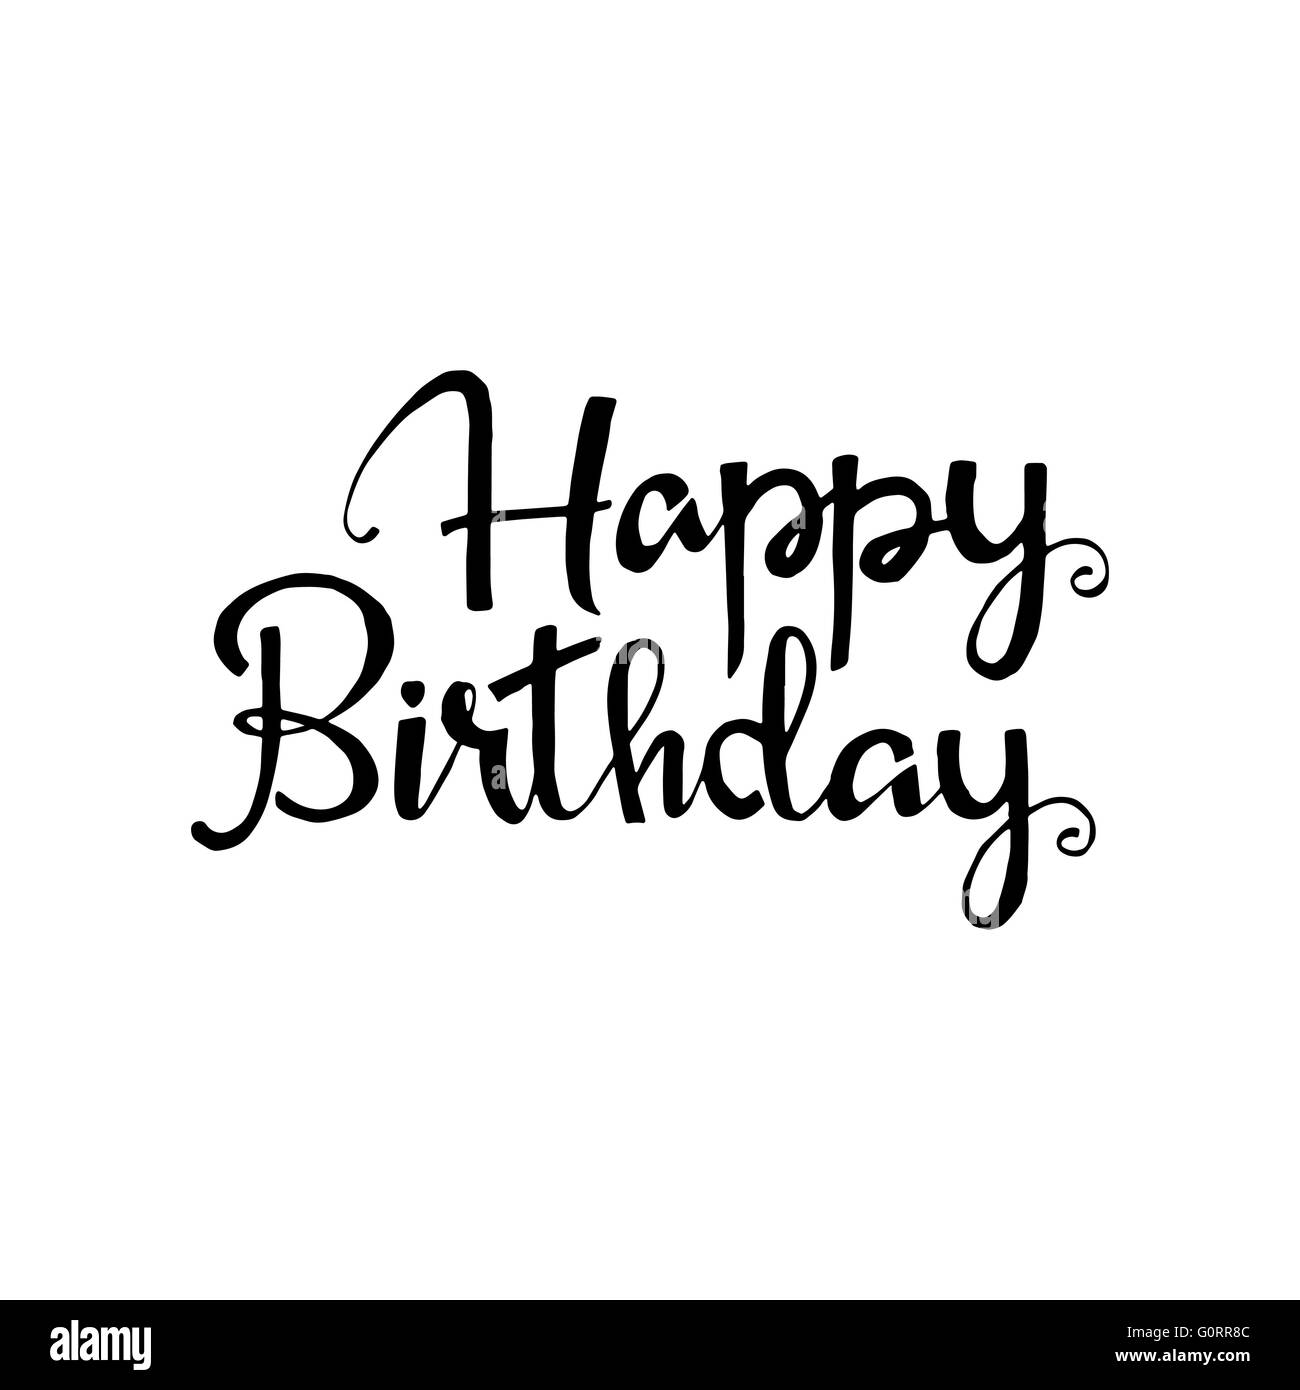 Happy birthday phrase handwritten lettering modern